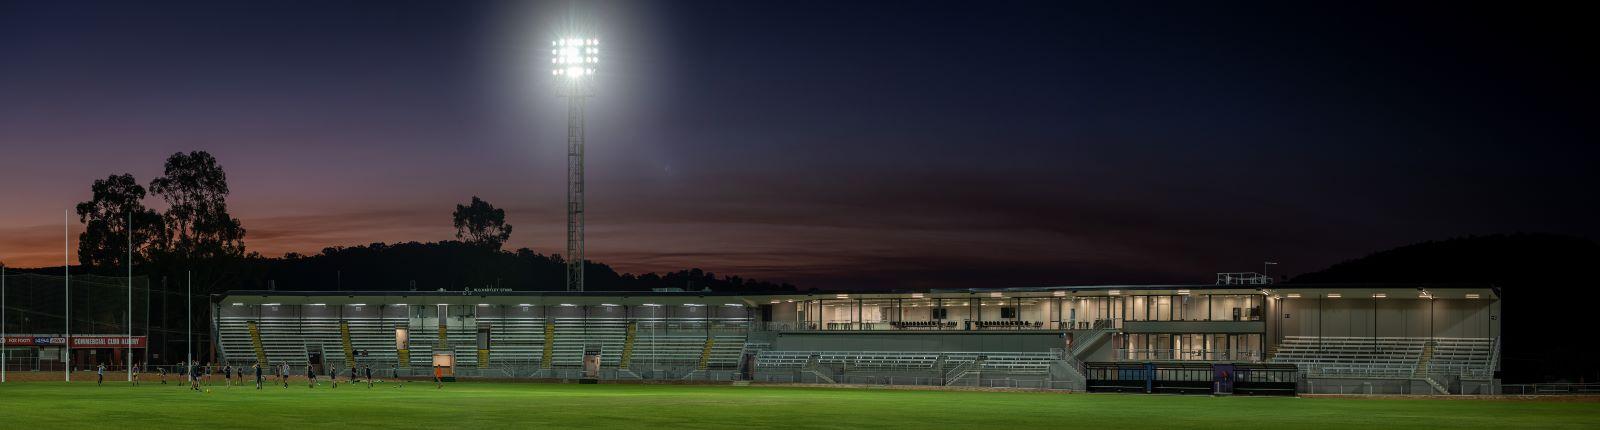 Lavington Sports Ground Stadium